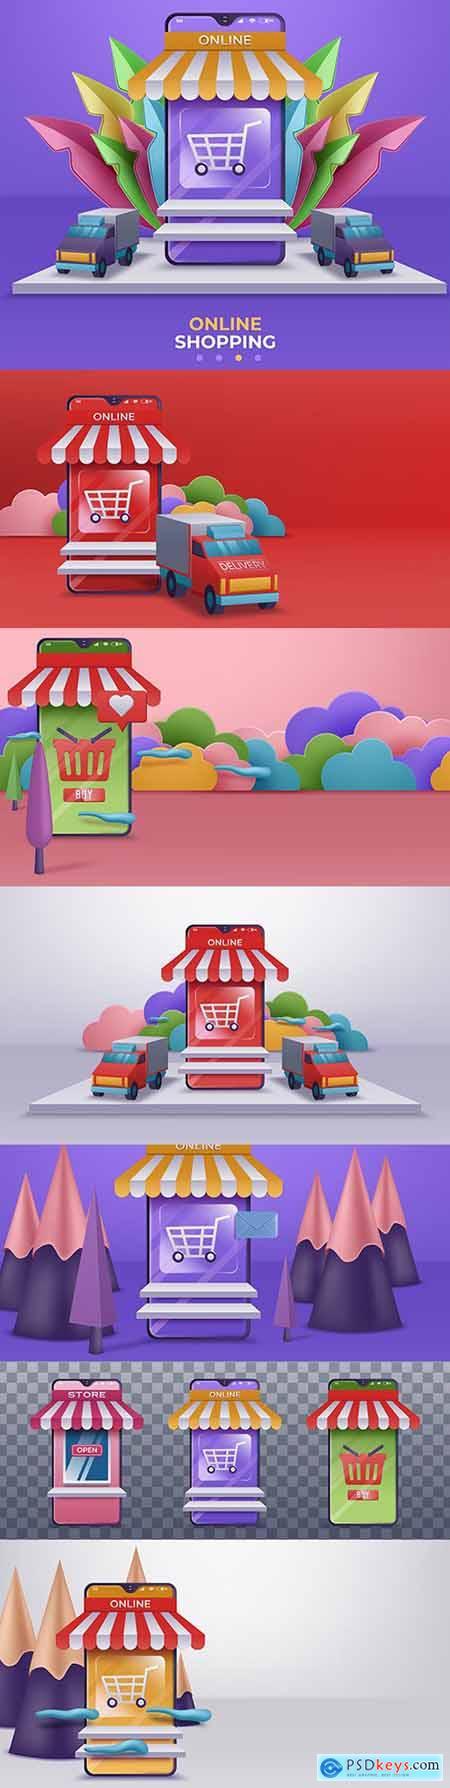 Online store and mobile application design 3d illustration